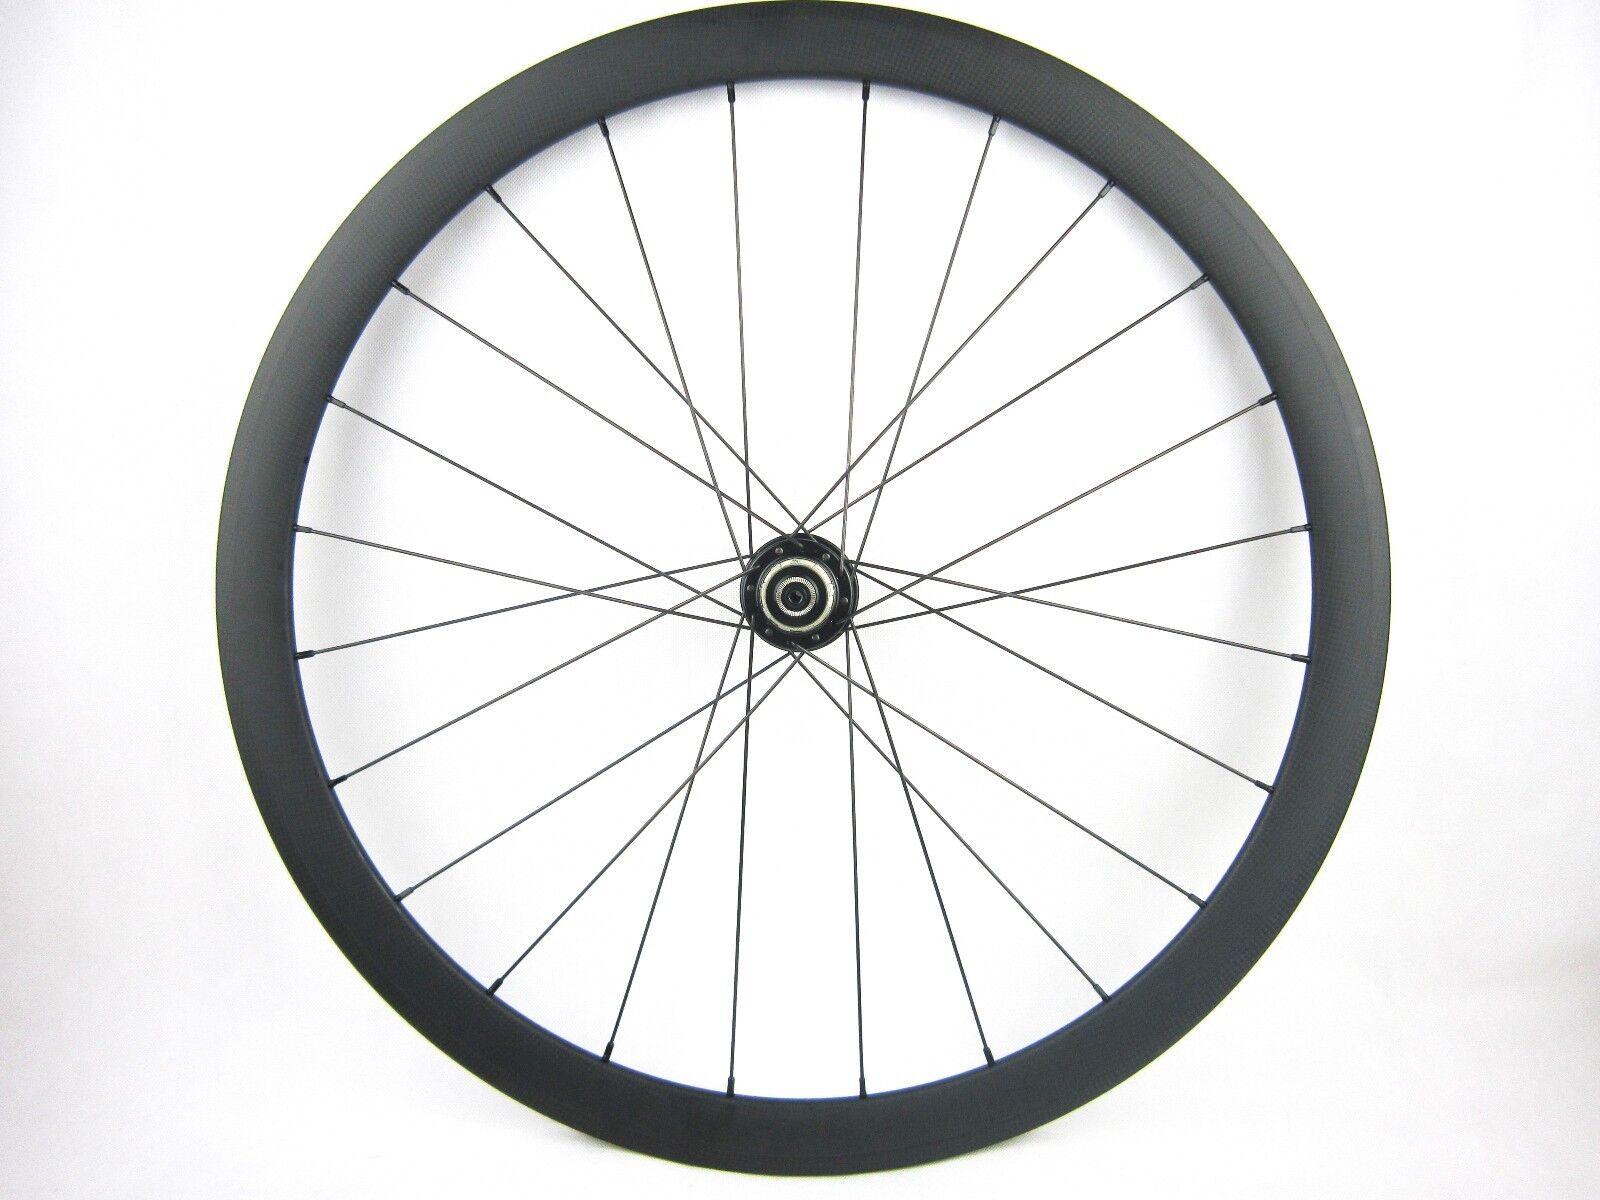 38mm clincher carbon fiber bicycle wheel disk brake 700C,rear only    25mm width